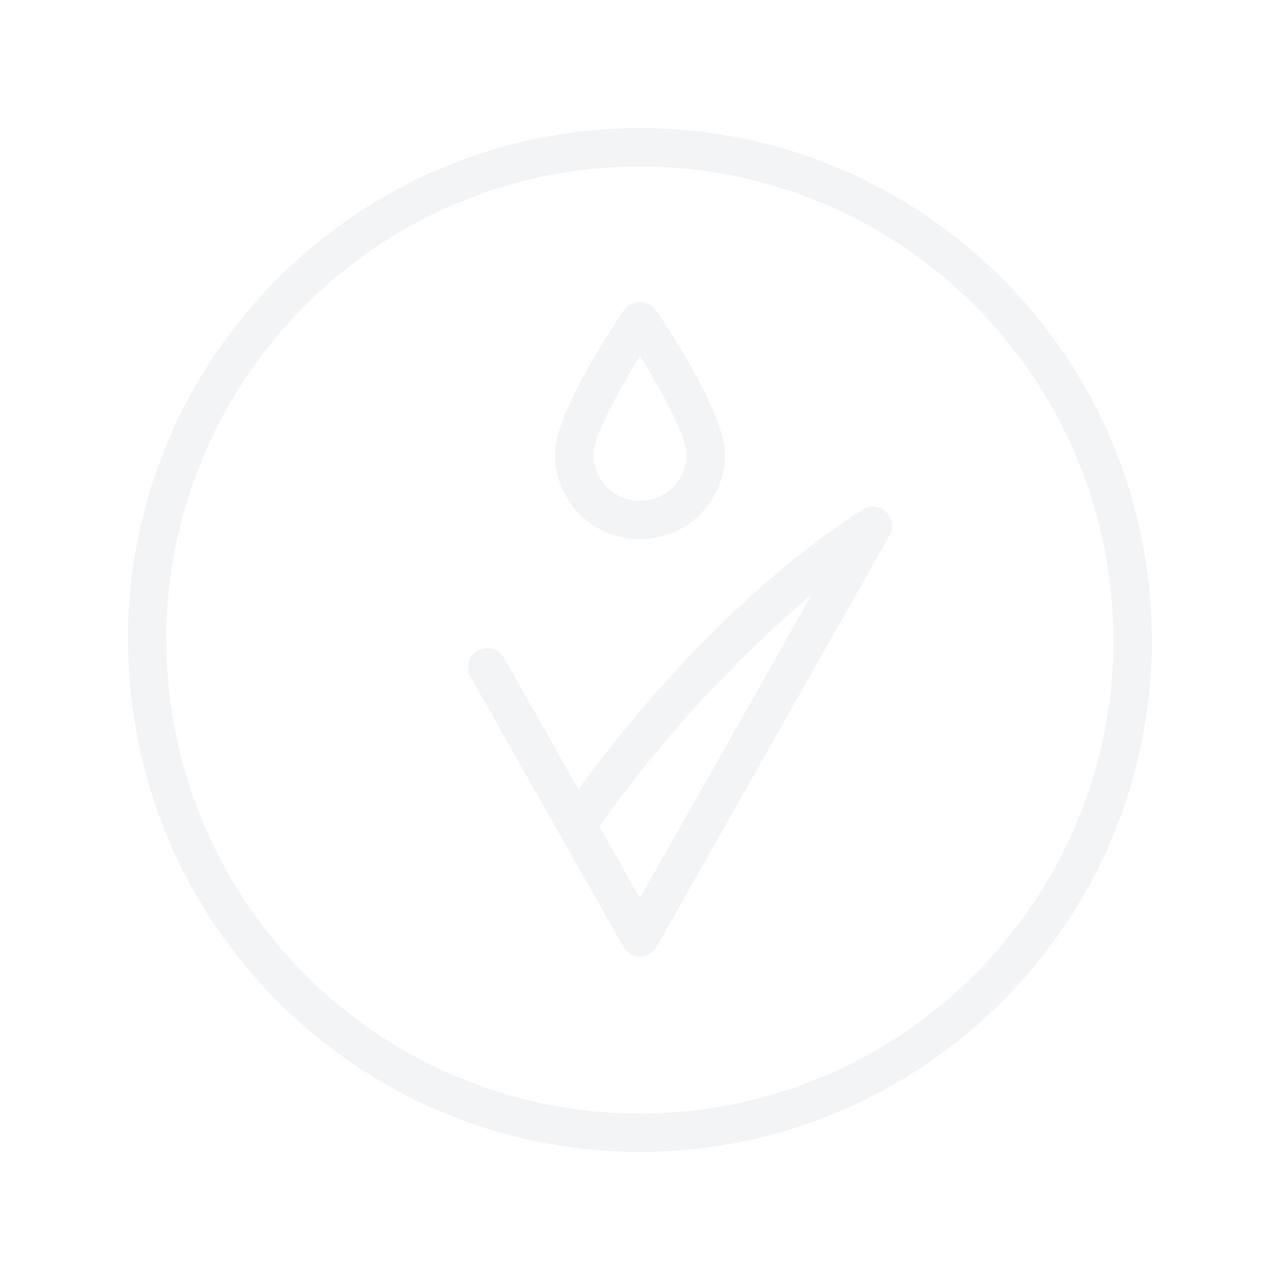 Makeup Revolution I Love Makeup Chocolate Palette 22g